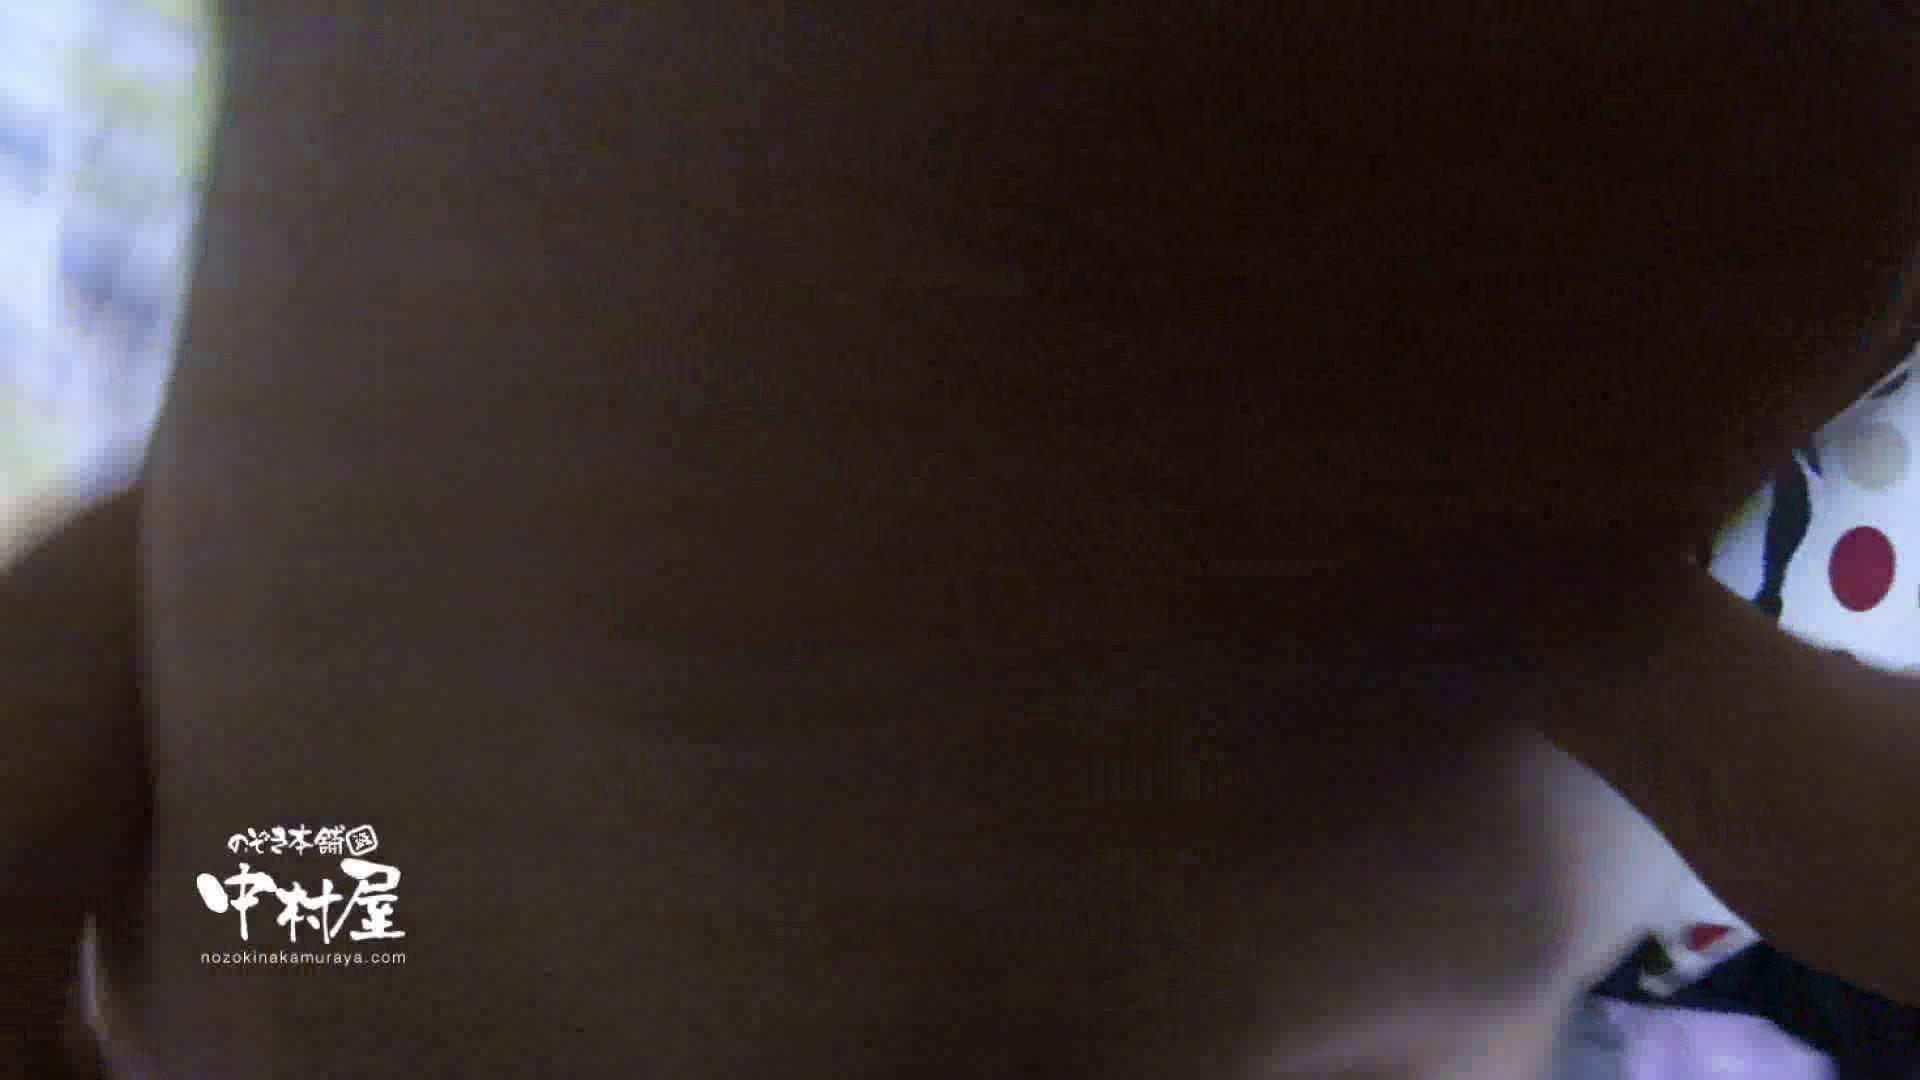 鬼畜 vol.09 無慈悲!中出し爆乳! 後編 爆乳 盗撮セックス無修正動画無料 95画像 83